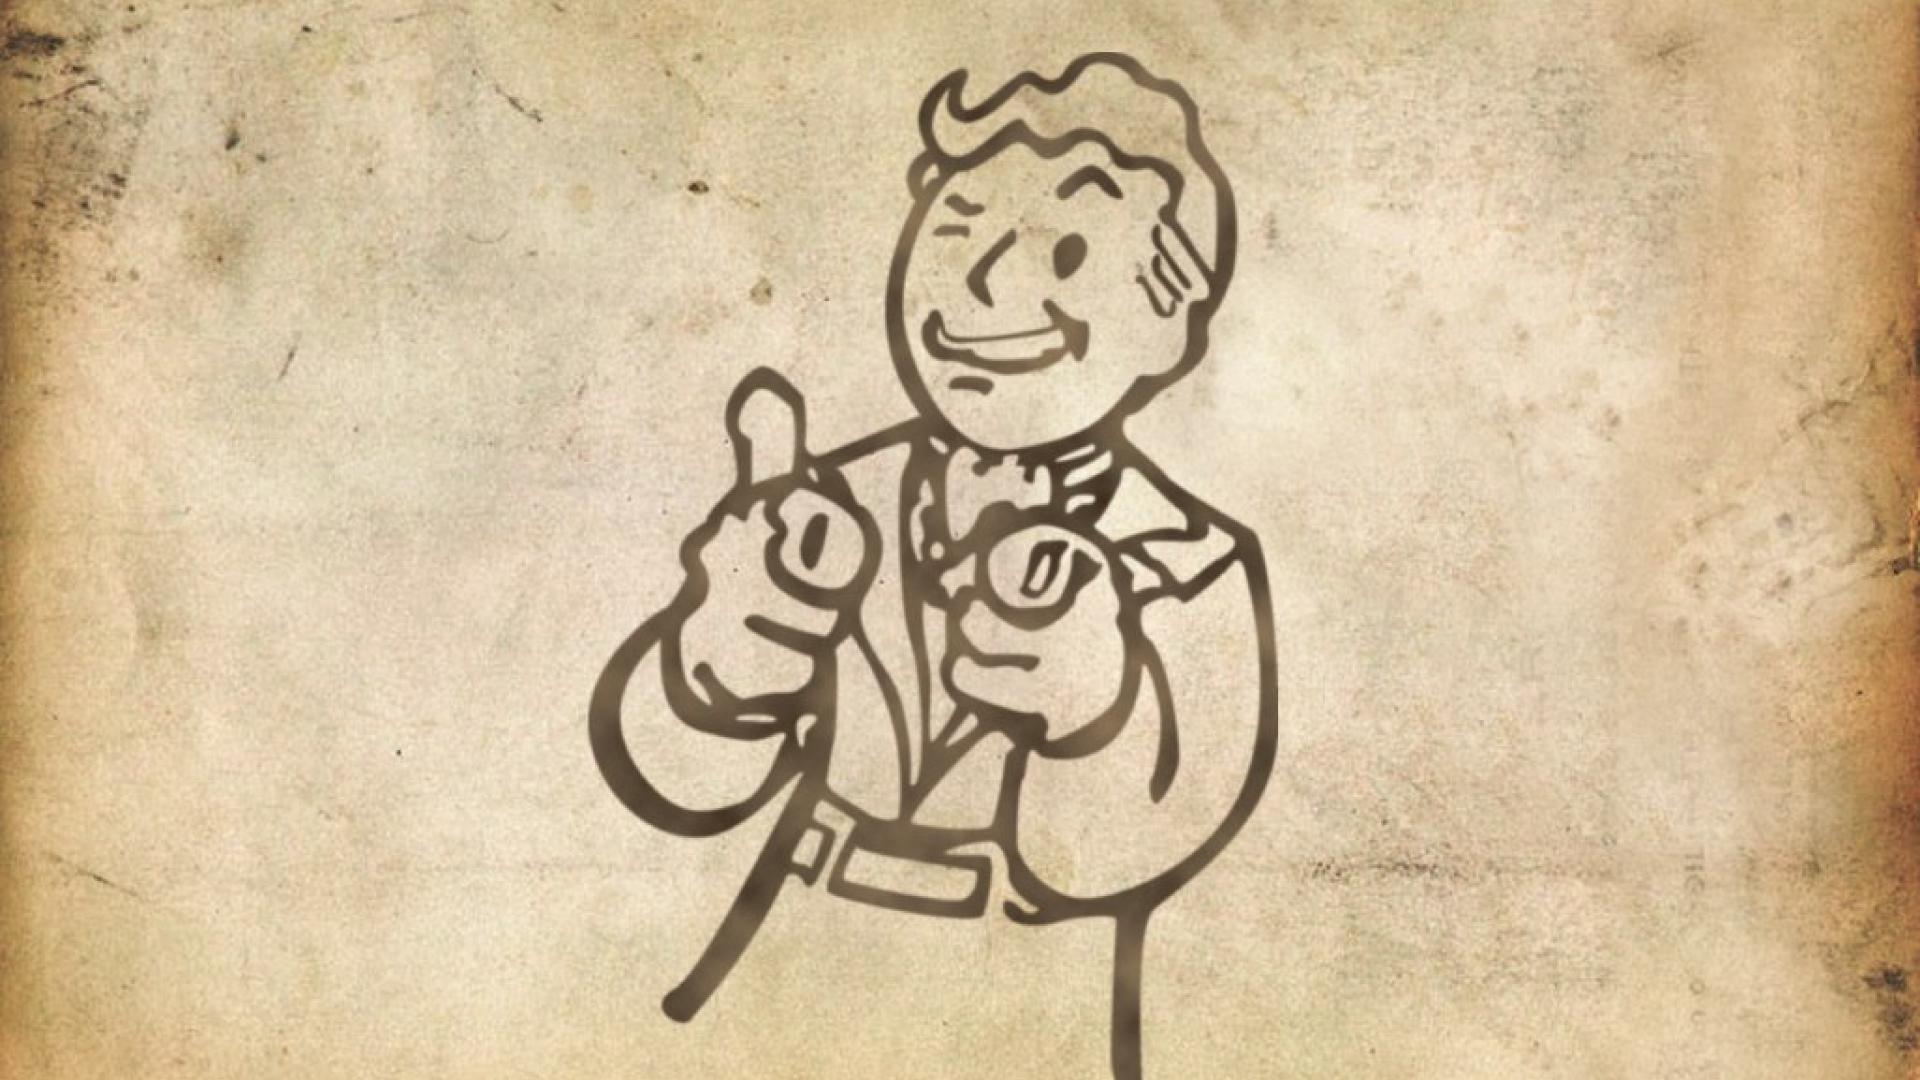 Similiar <b>Pip Boy Fallout 3</b> Concept Art Keywords